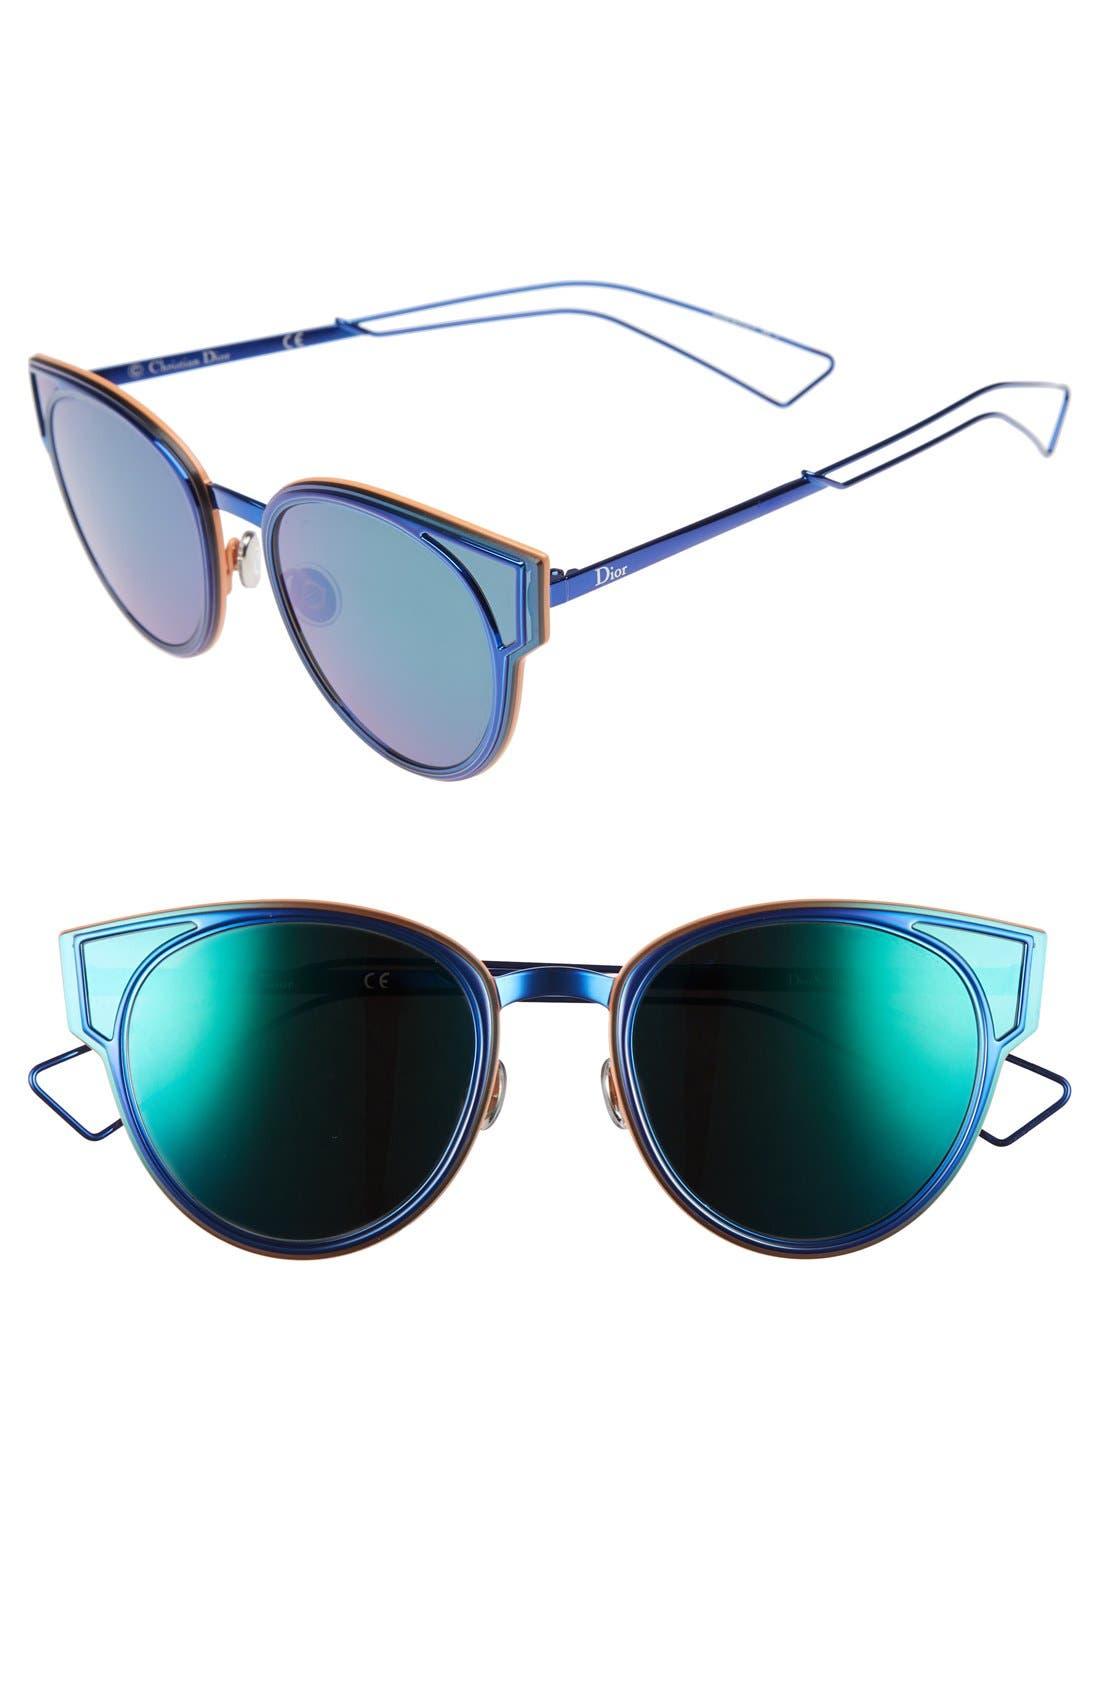 Sculpts 53mm Cat Eye Sunglasses,                             Main thumbnail 1, color,                             Shiny Blue